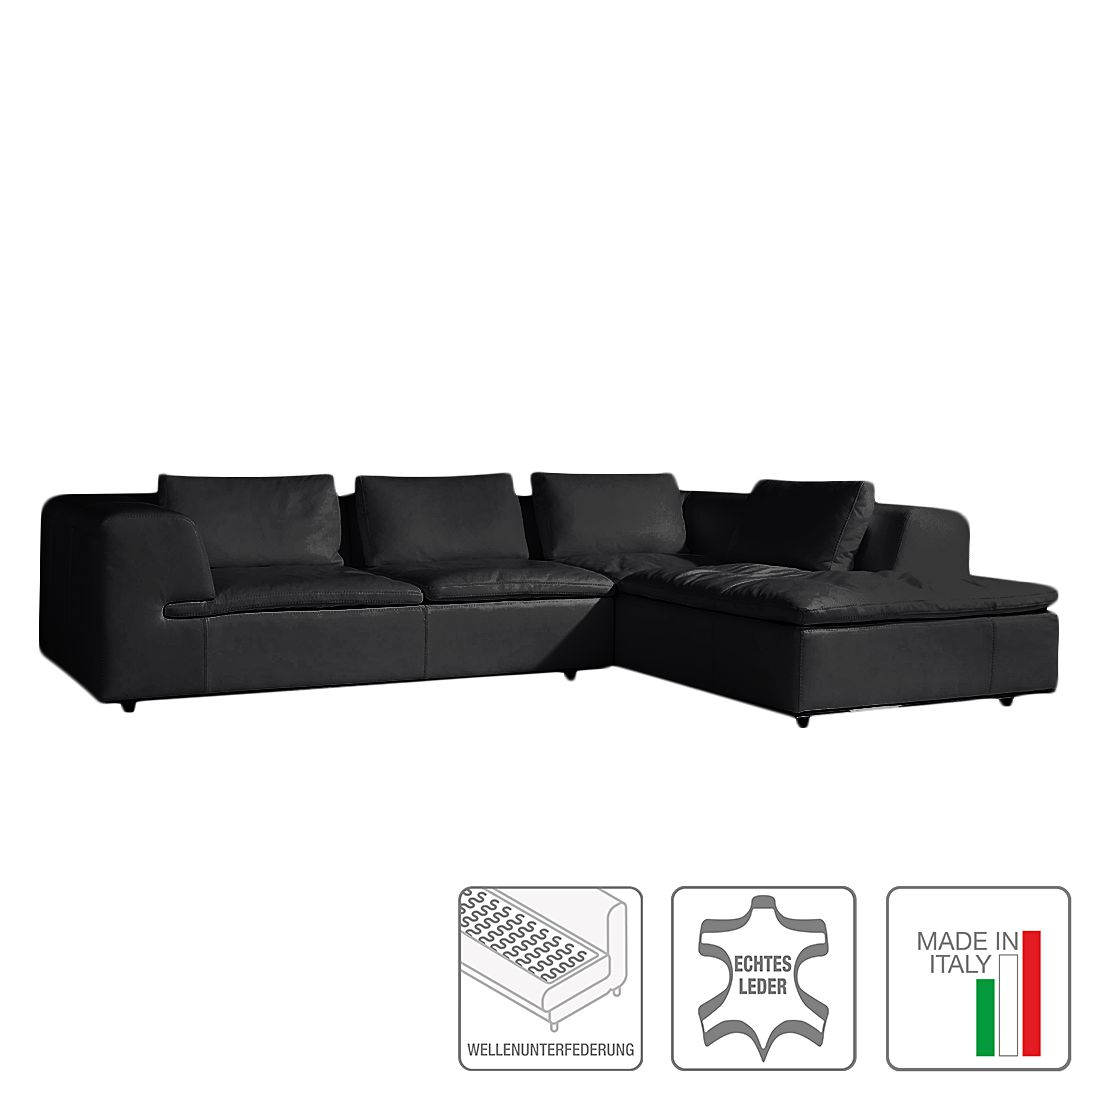 Ecksofa Seneca I – Echtleder – Ottomane davorstehend rechts – Schwarz, Trend Italiano jetzt kaufen